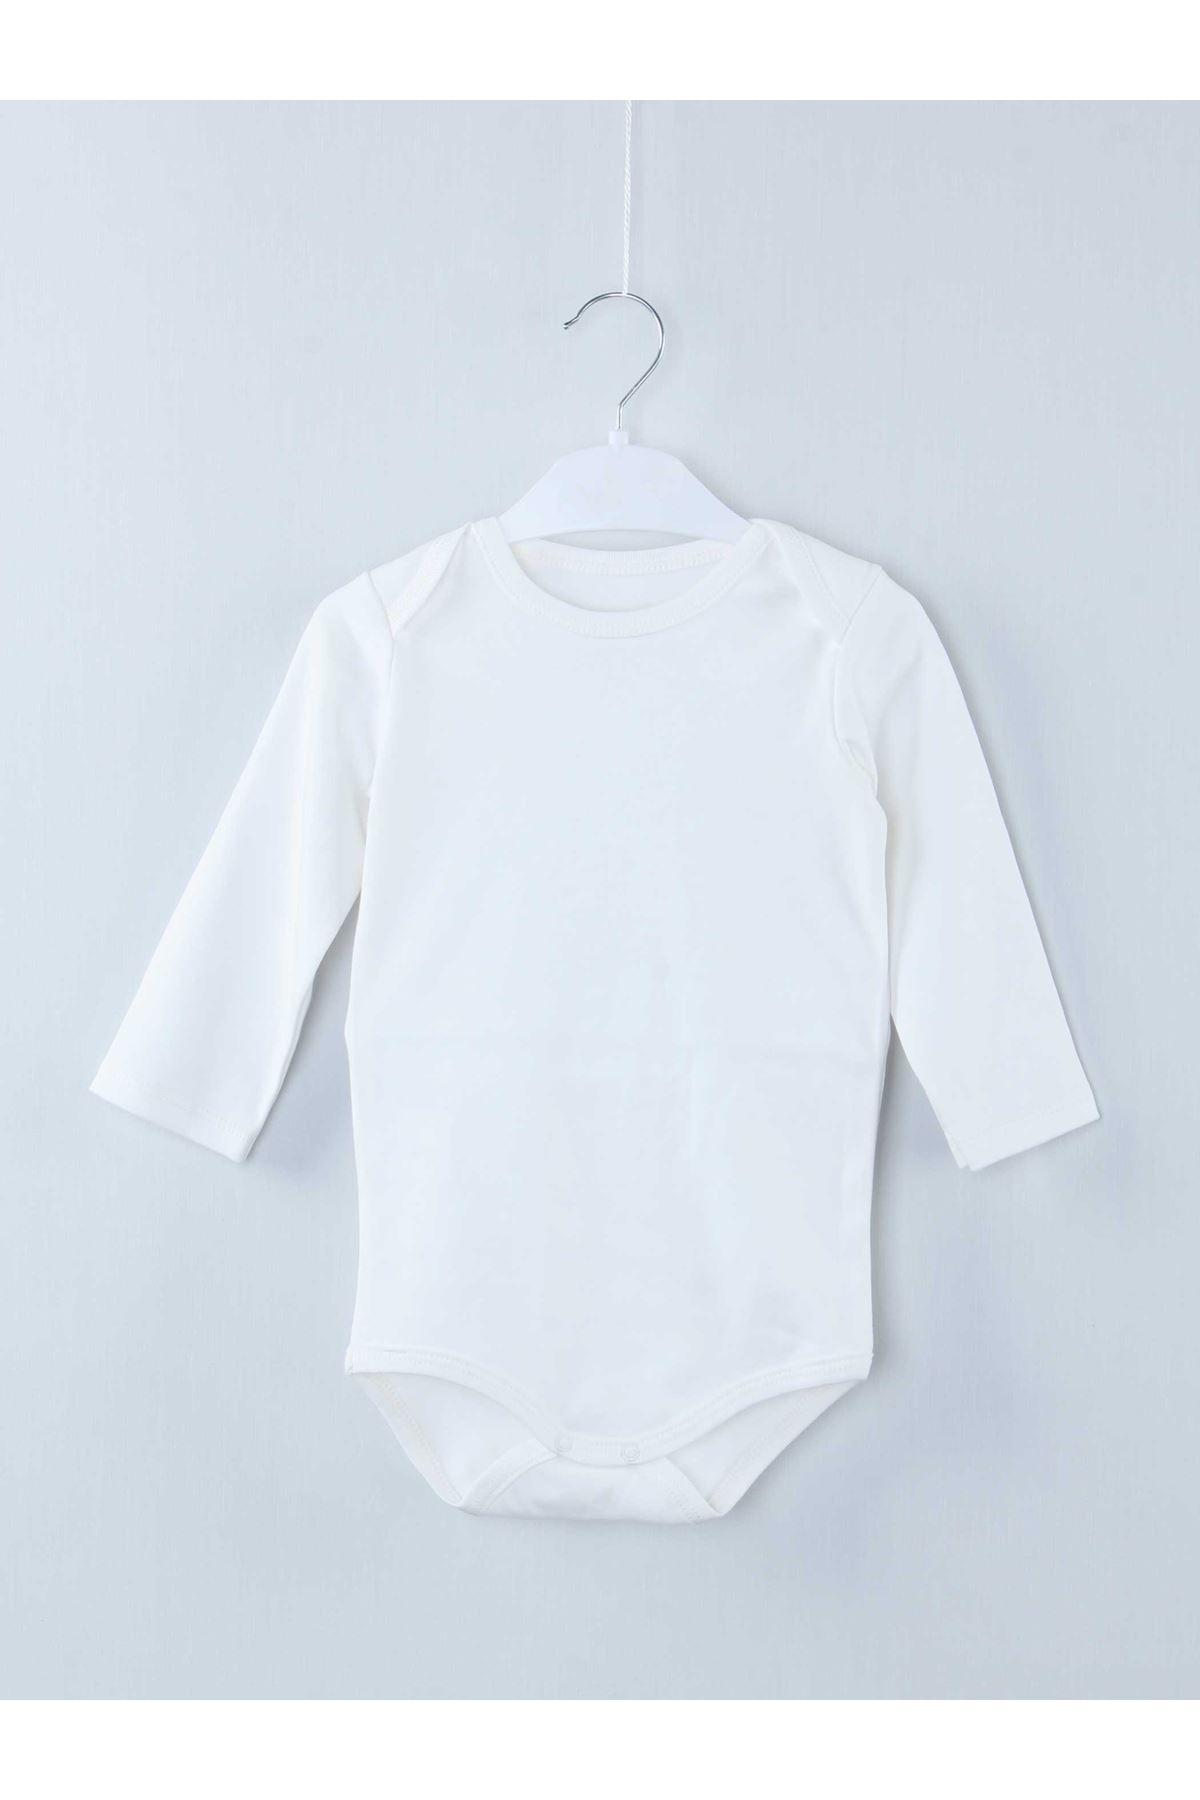 Cream Long Sleeve Baby Badi